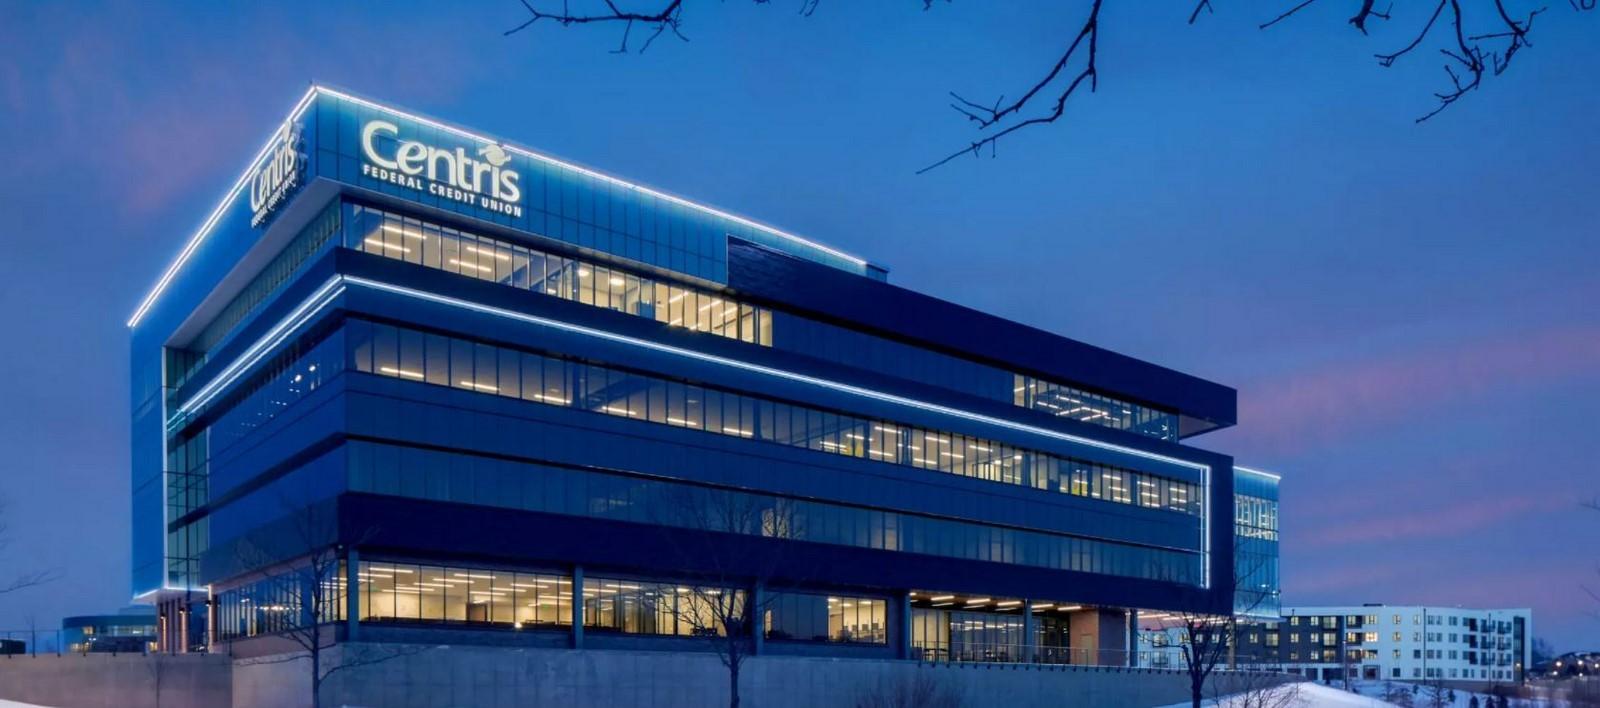 Architects in Omaha - Top 45 Architects in Omaha - Sheet23